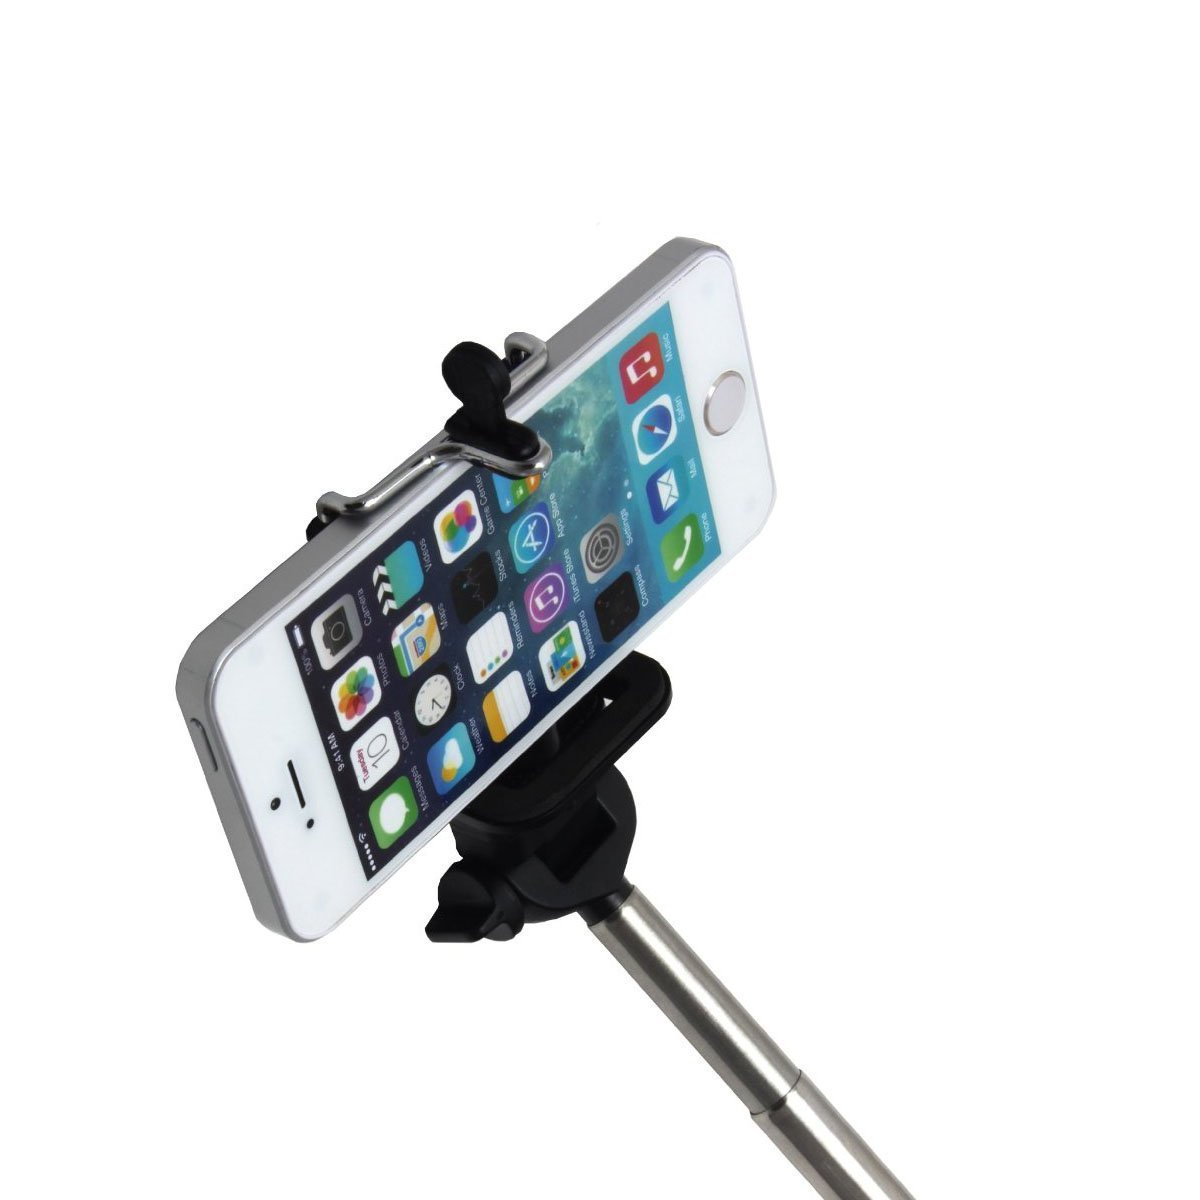 extendable selfie handheld stick monopod phone holder wireless shutter f6 ebay. Black Bedroom Furniture Sets. Home Design Ideas